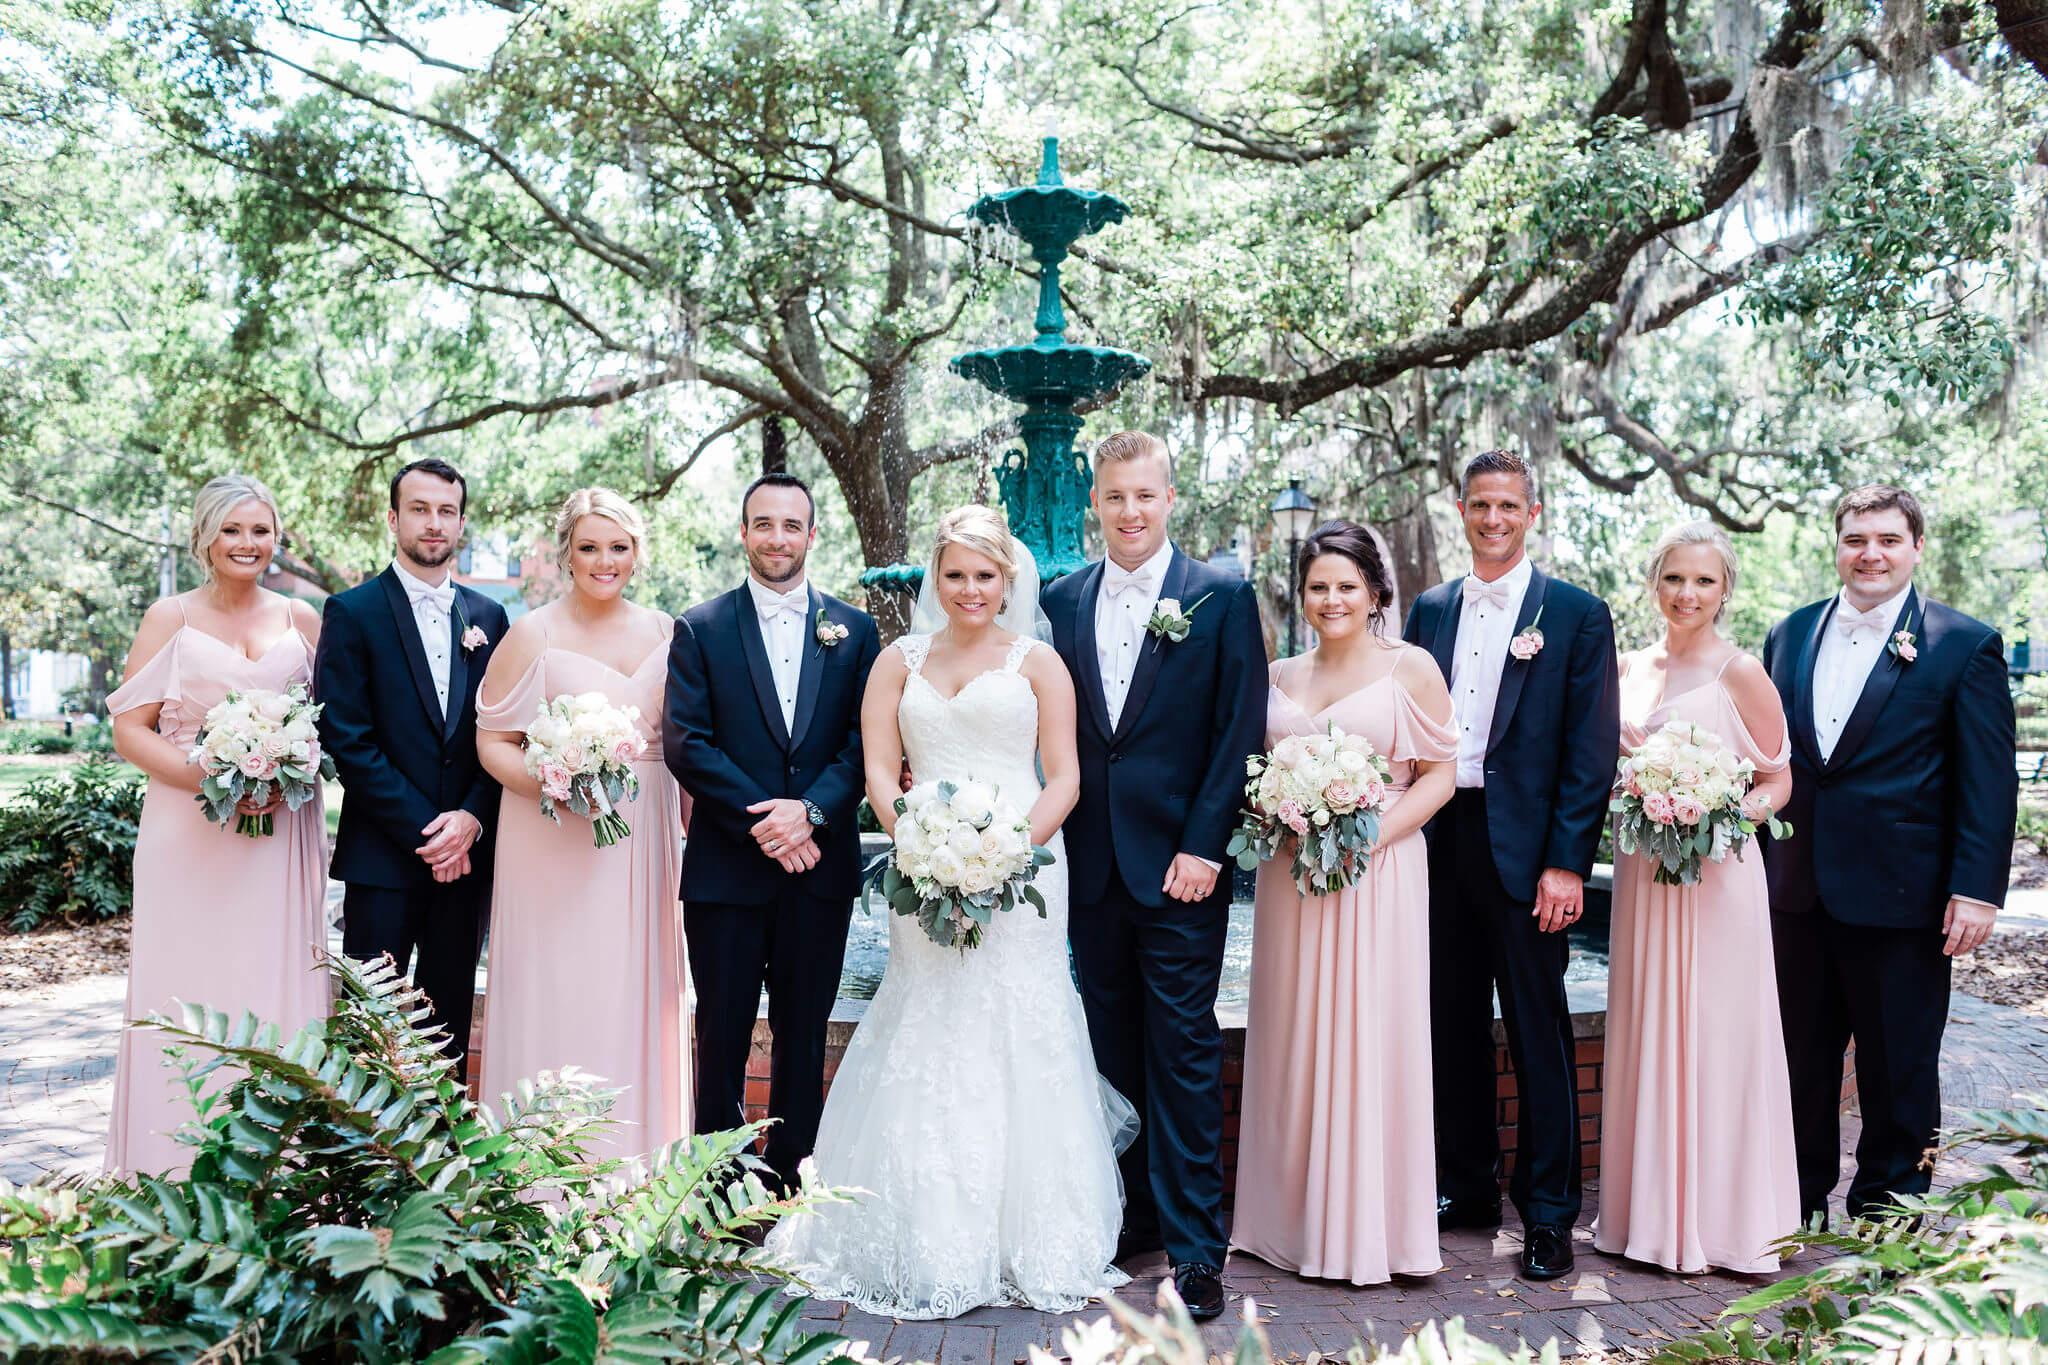 apt-b-photography-savannah-wedding-photographer-savannah-wedding-savannah-elopement-intimate-wedding-photographer-50.JPG